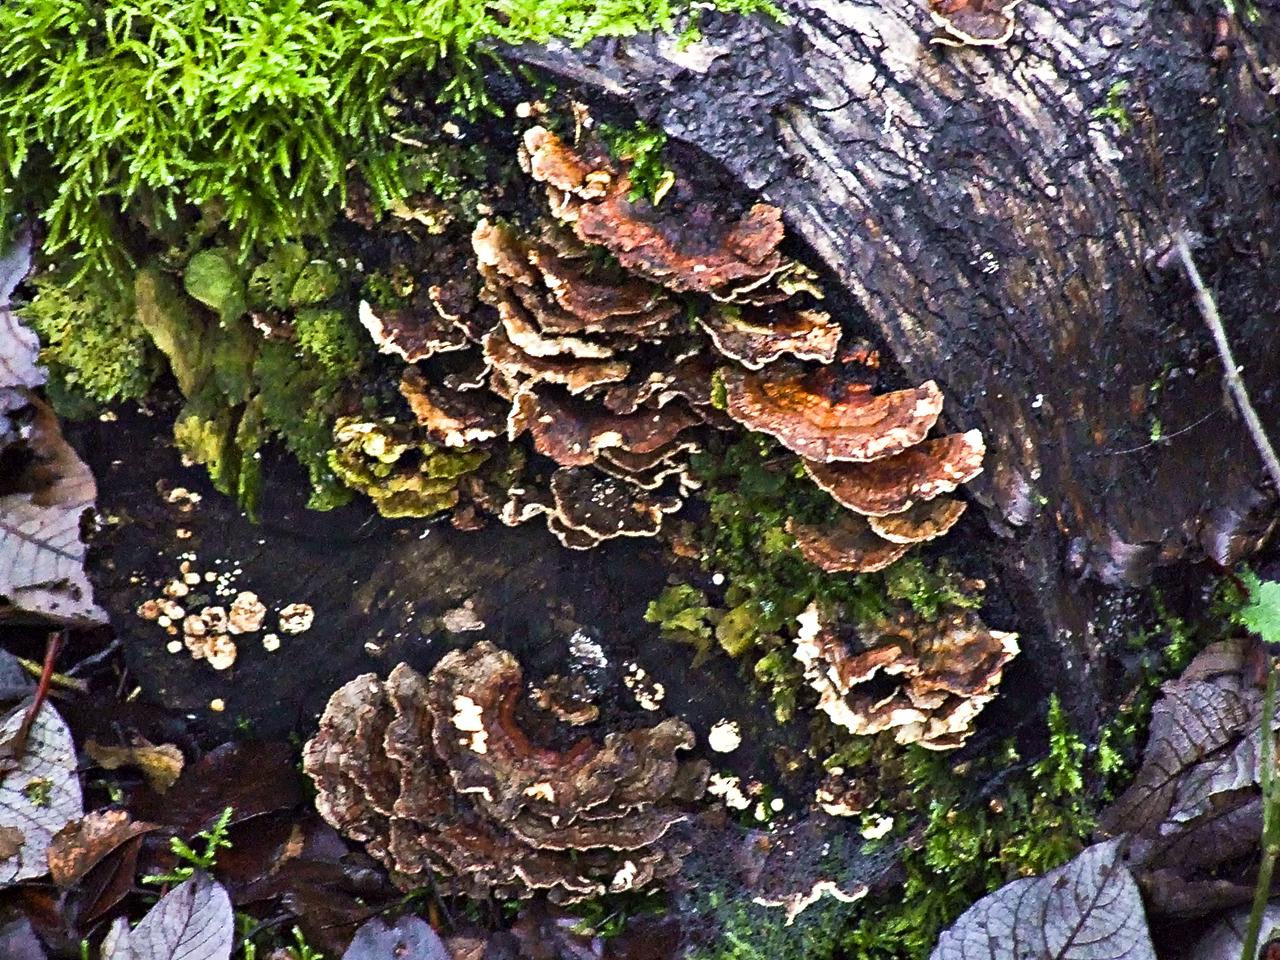 20201126-fungus-001.jpg